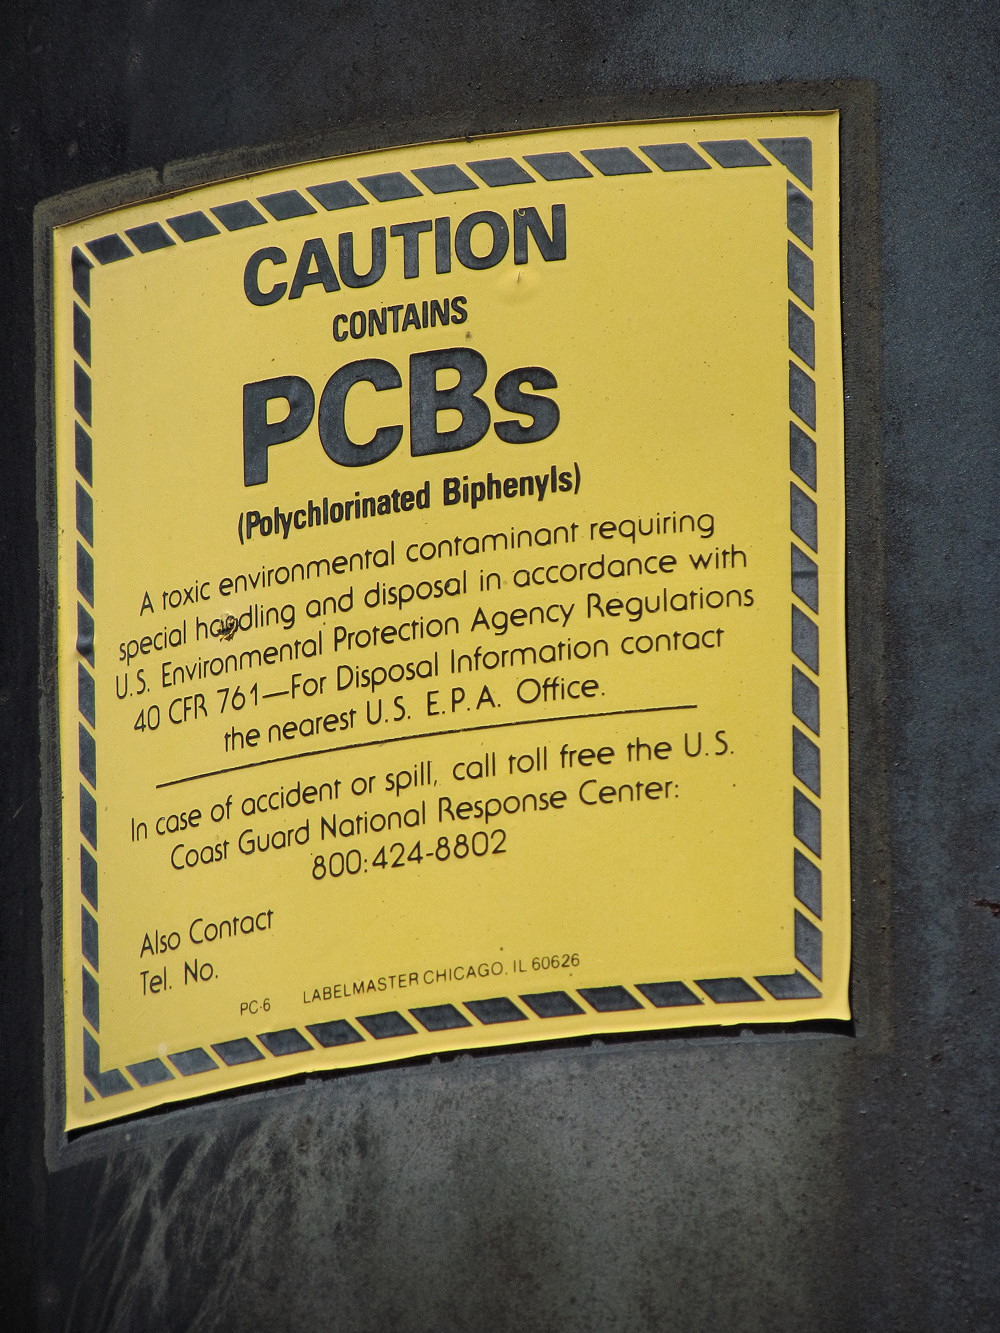 CP-SLOPE-wb-gantry-power-supply-transformer-PCB-warning.jpg